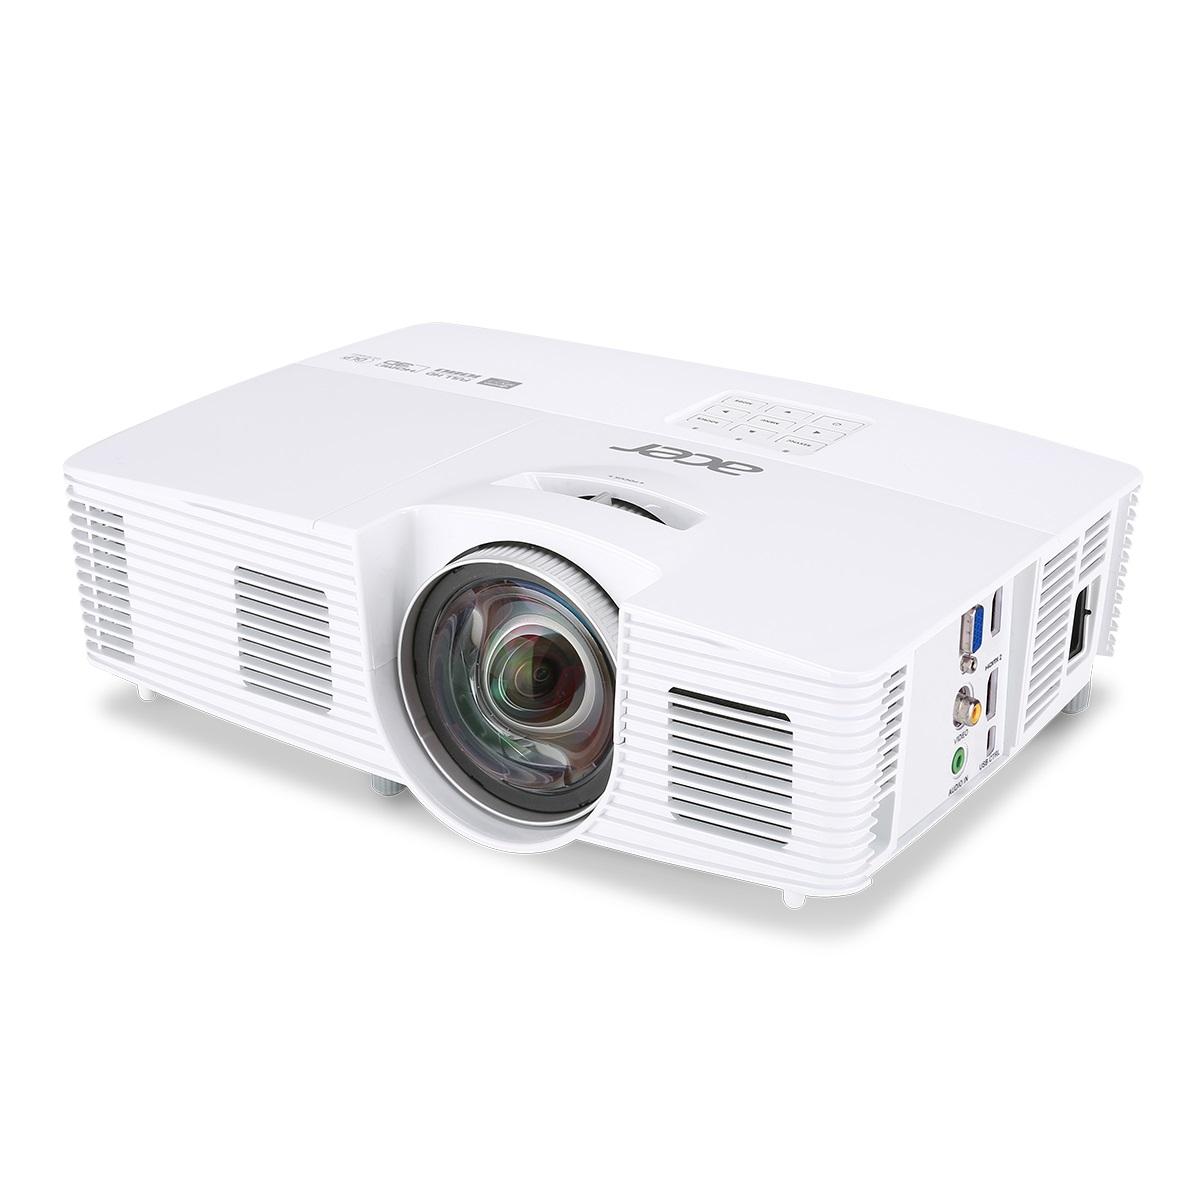 Acer H6517ST DLP / 3D / 1920x1080 1080p / 3000 ANSI / 10000:1 / VGA / HDMI / HDMI(MHL) / 1x2W repro / 2,5 KG